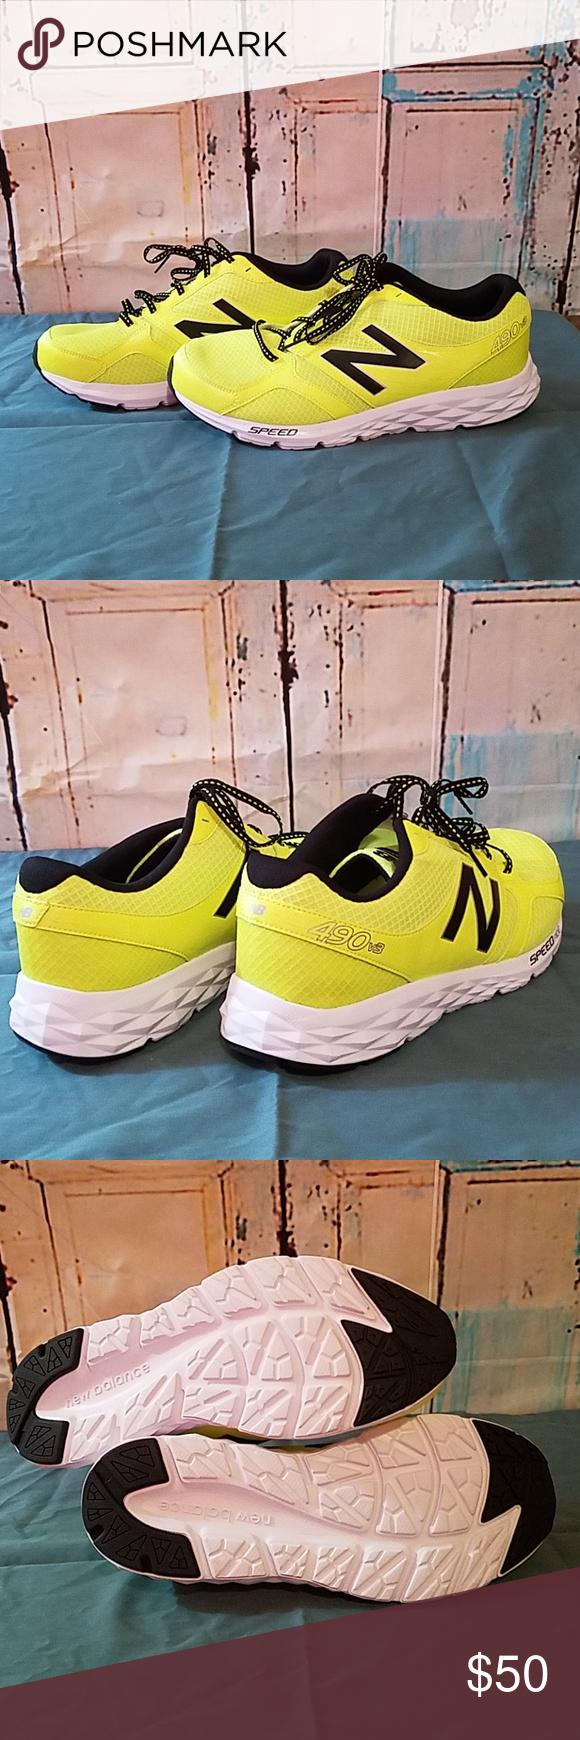 Balance 490v3 Speed Ride Sneakers sz14